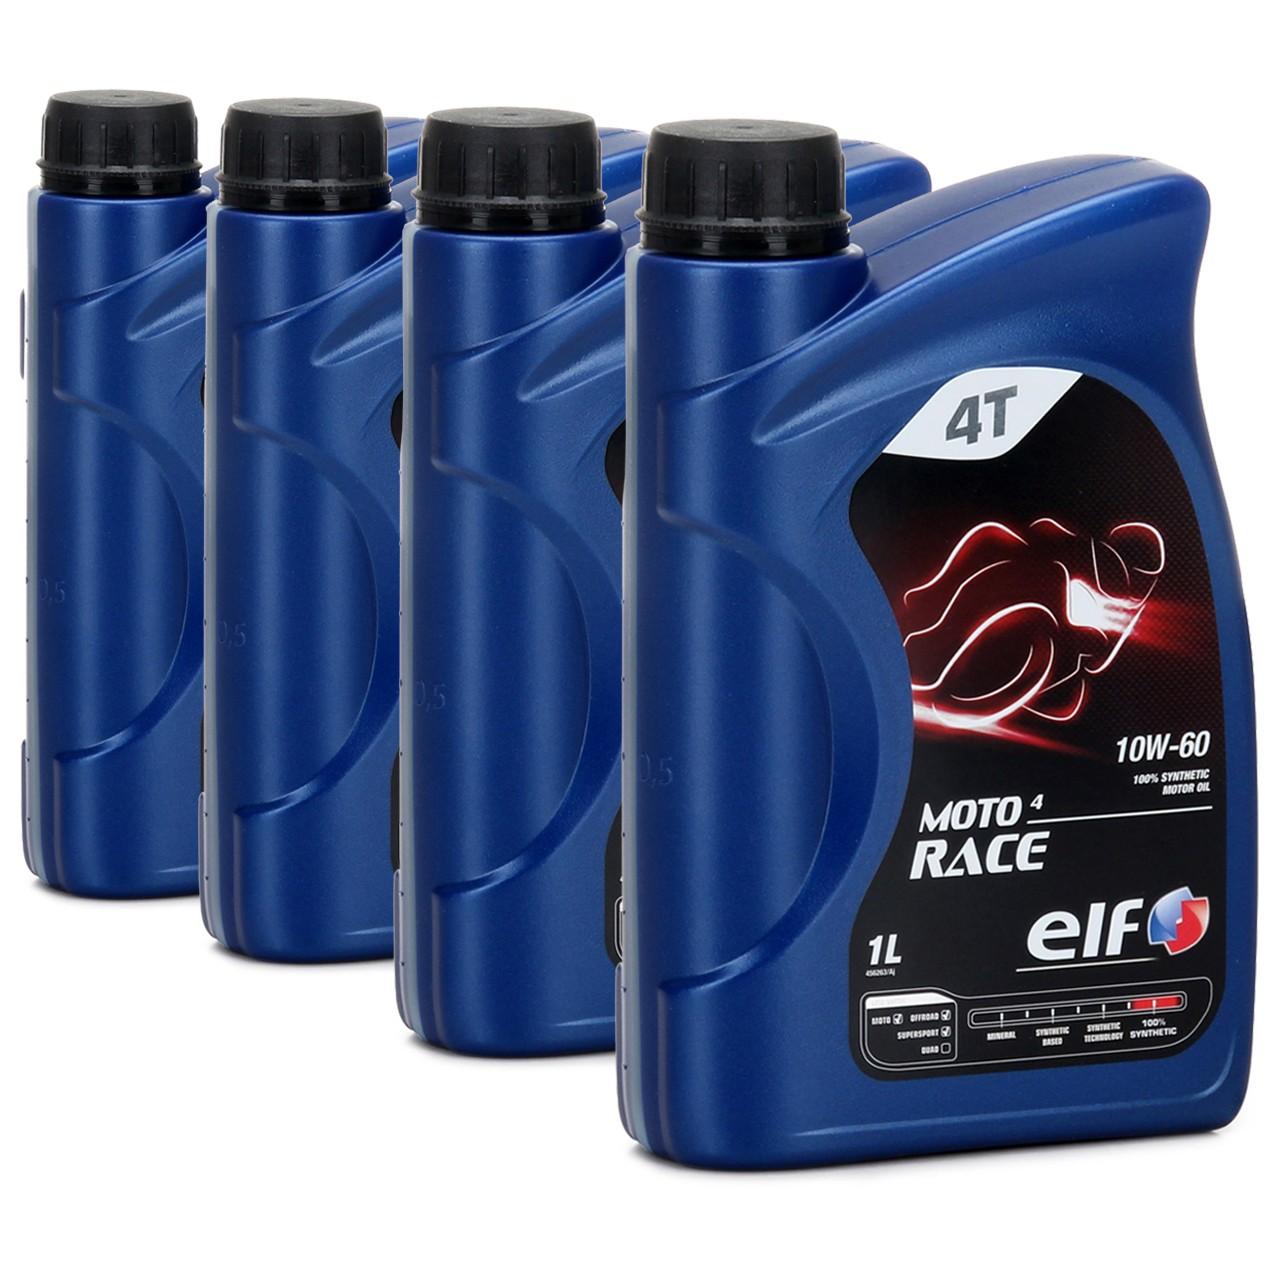 ELF Motoröl ÖL 4T 4-TAKT MOTO 4 RACE 10W-60 10W60 API SN JASO MA2 - 4L 4 Liter